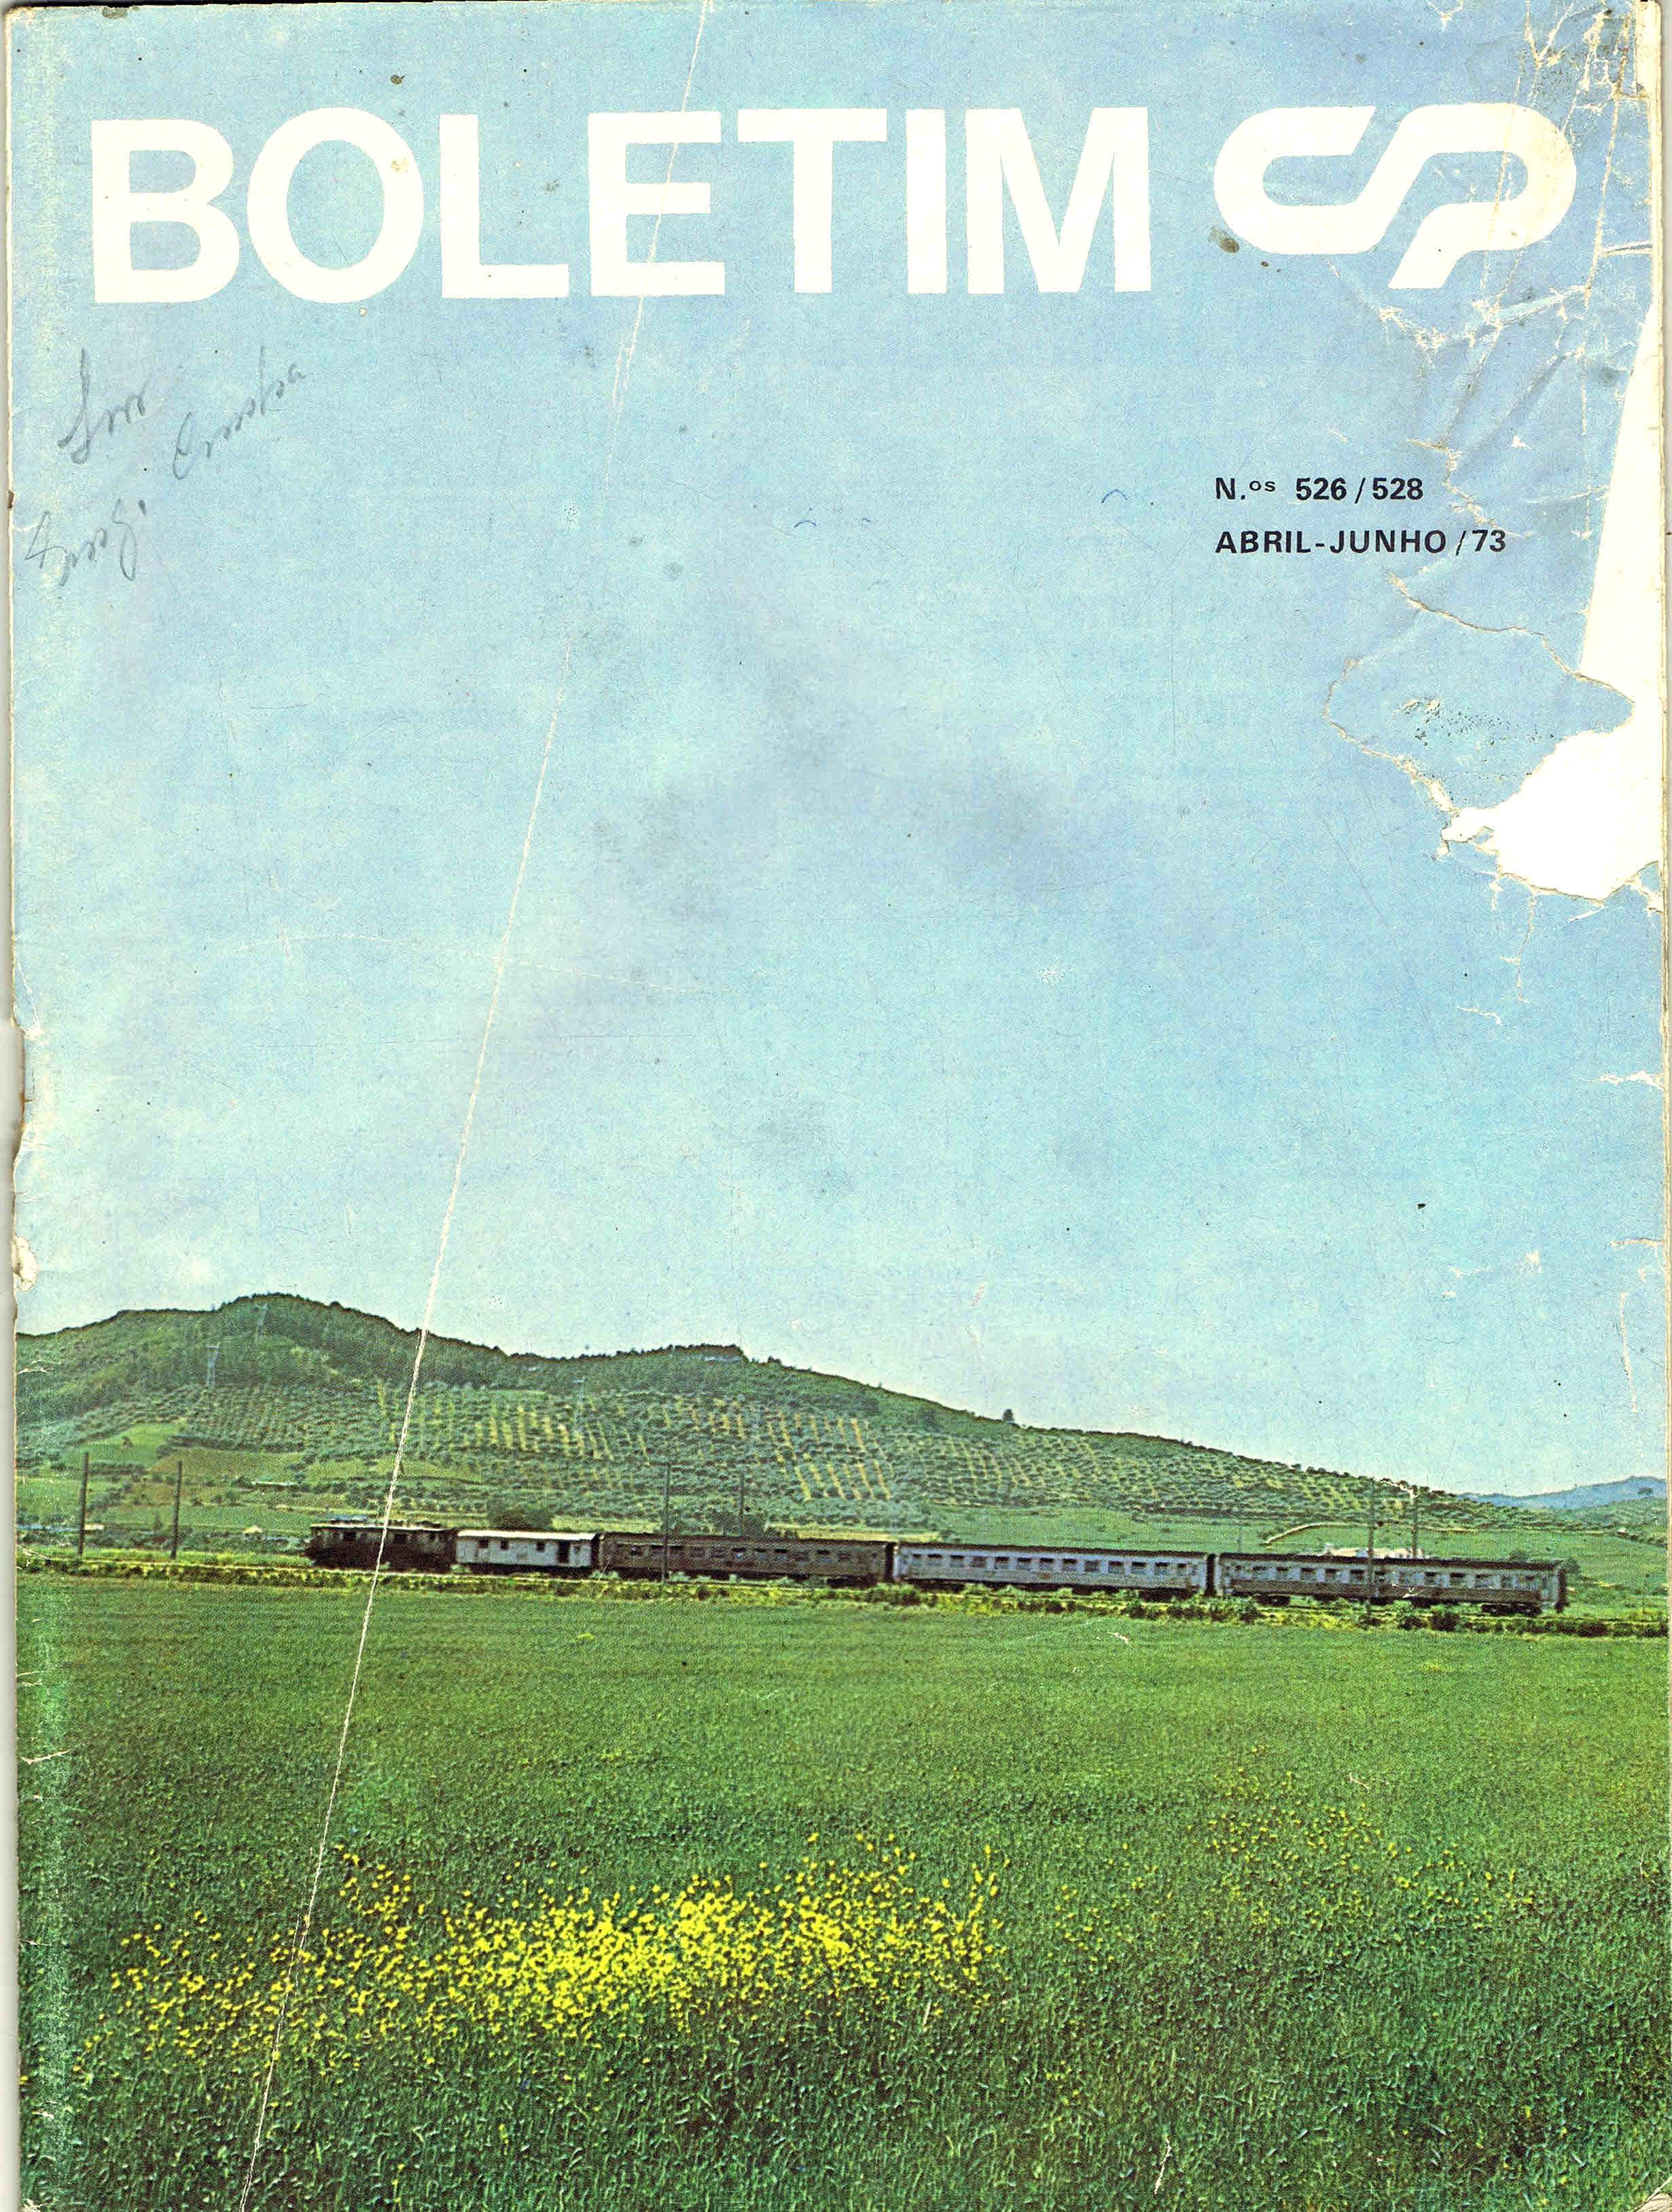 boletim da cp nº 526 528 abril junho 1973